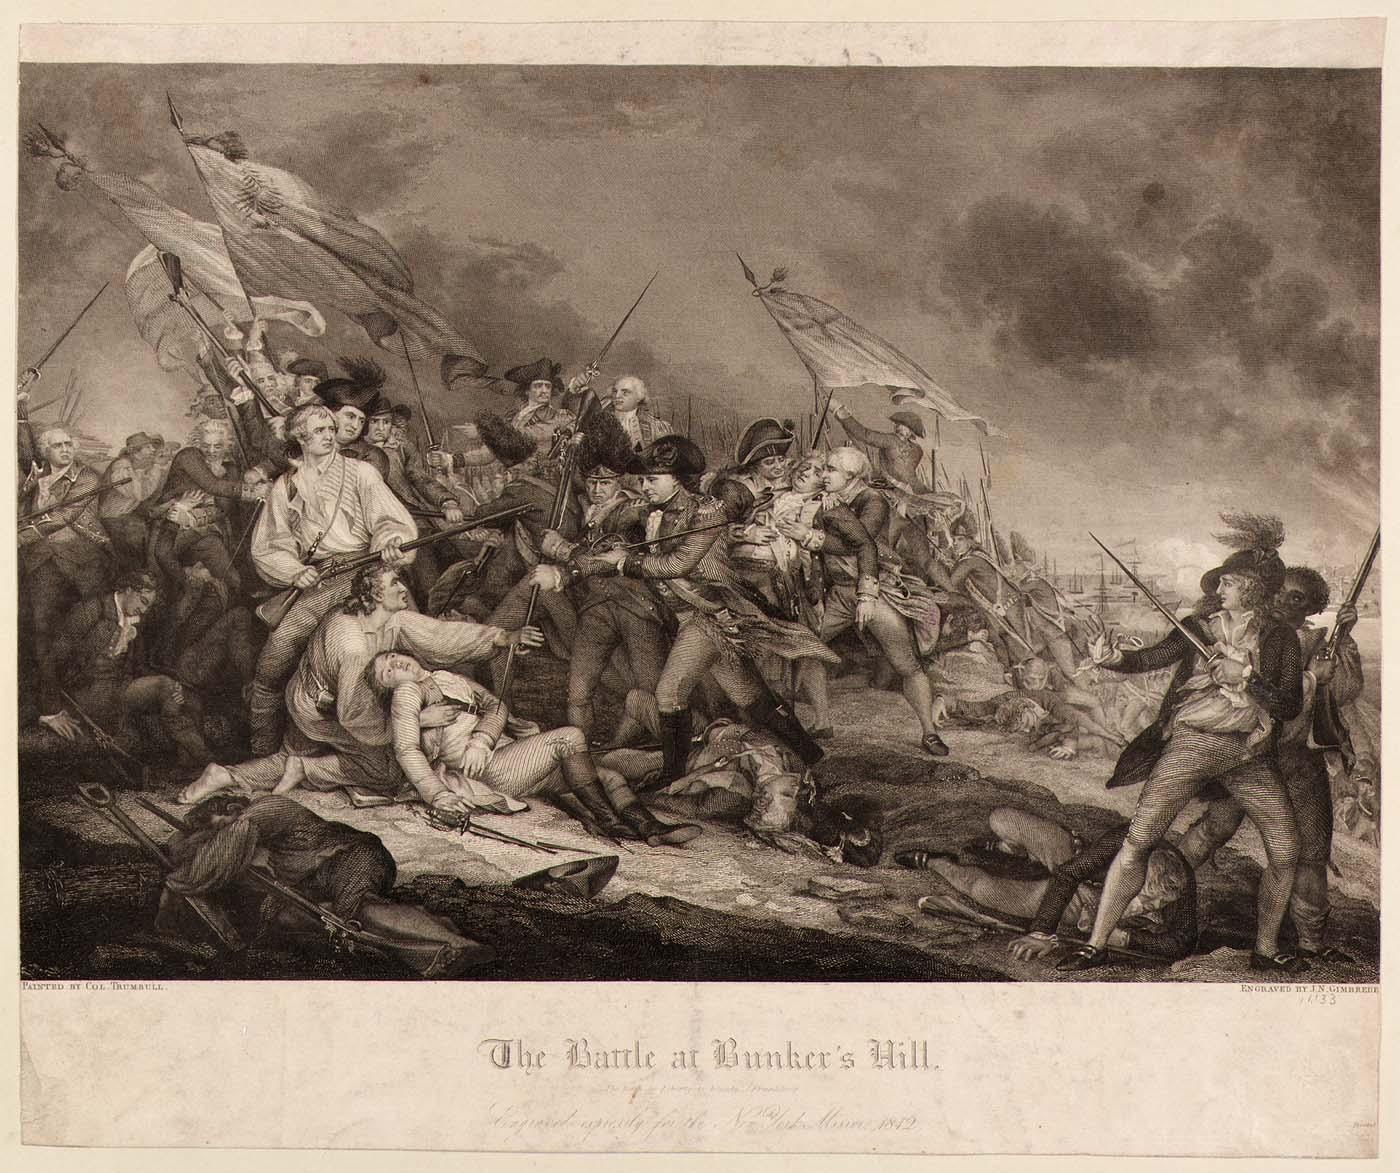 Joseph Napoleon Gimbrede, 'The Battle at Bunker's Hill.' Via the Smithsonian American Art Museum.